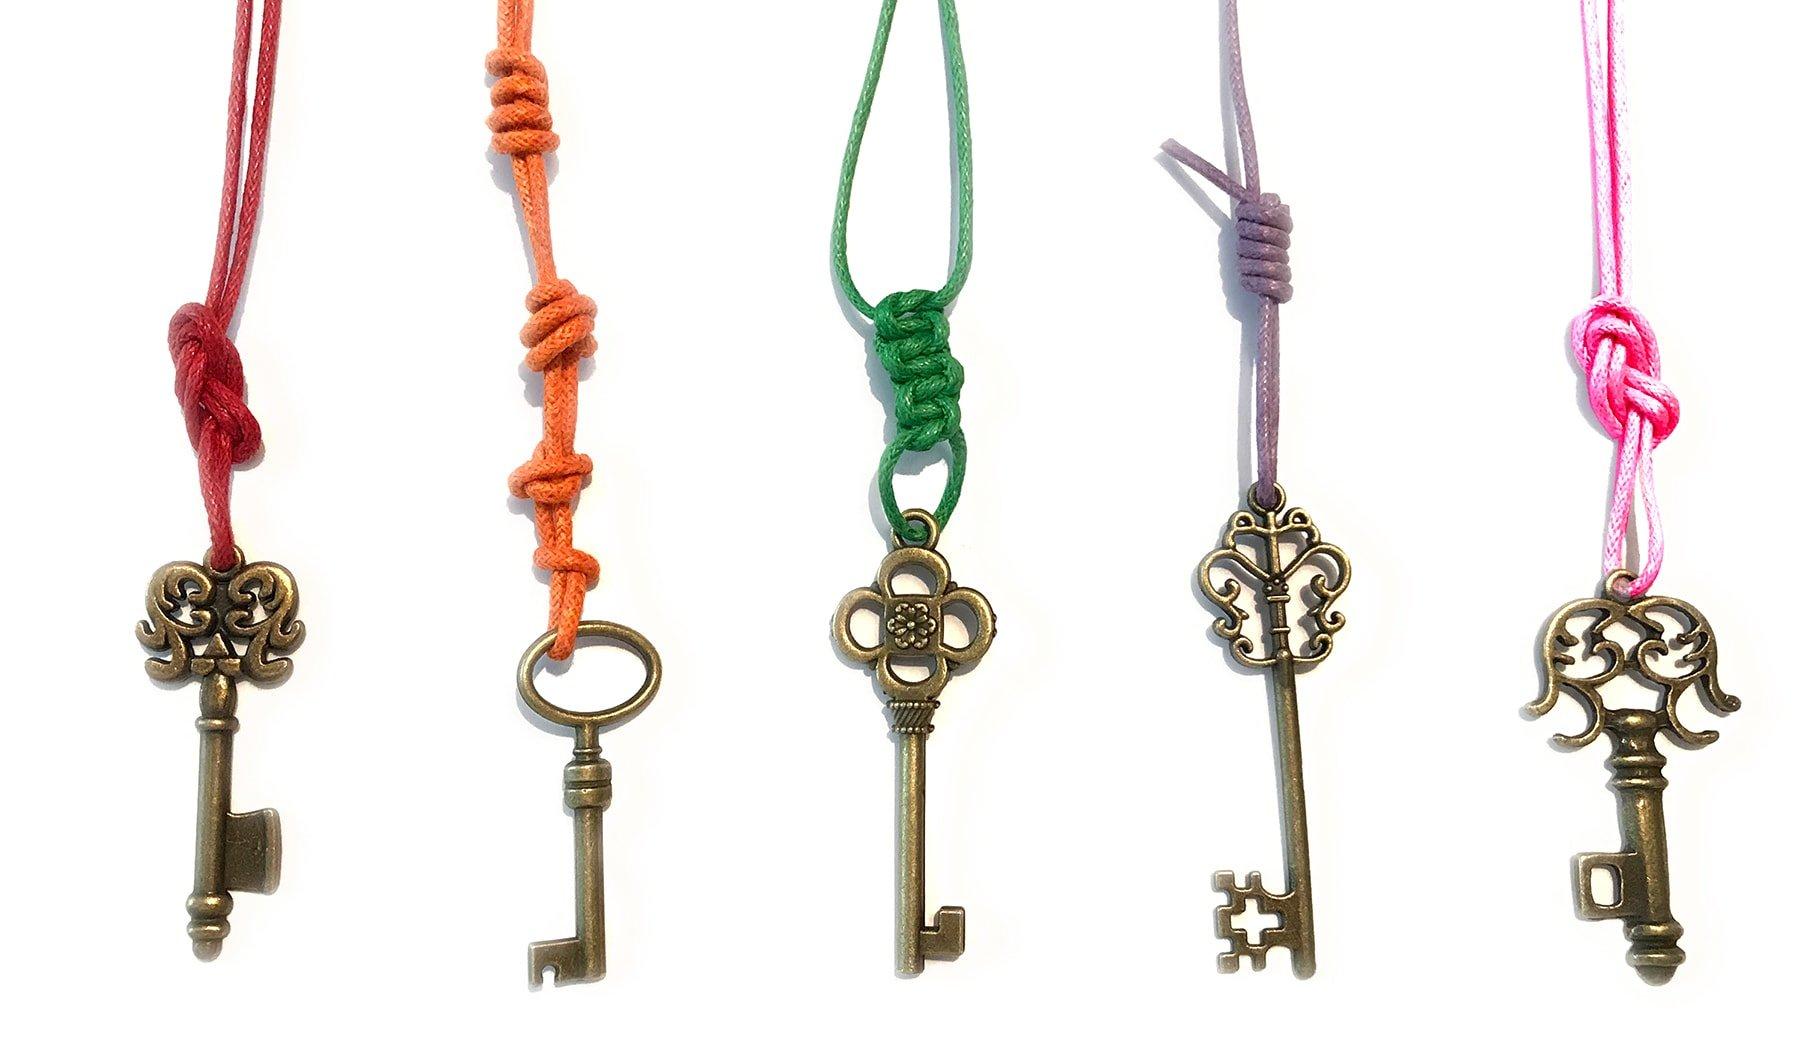 Schlüssel & Knotenmagie